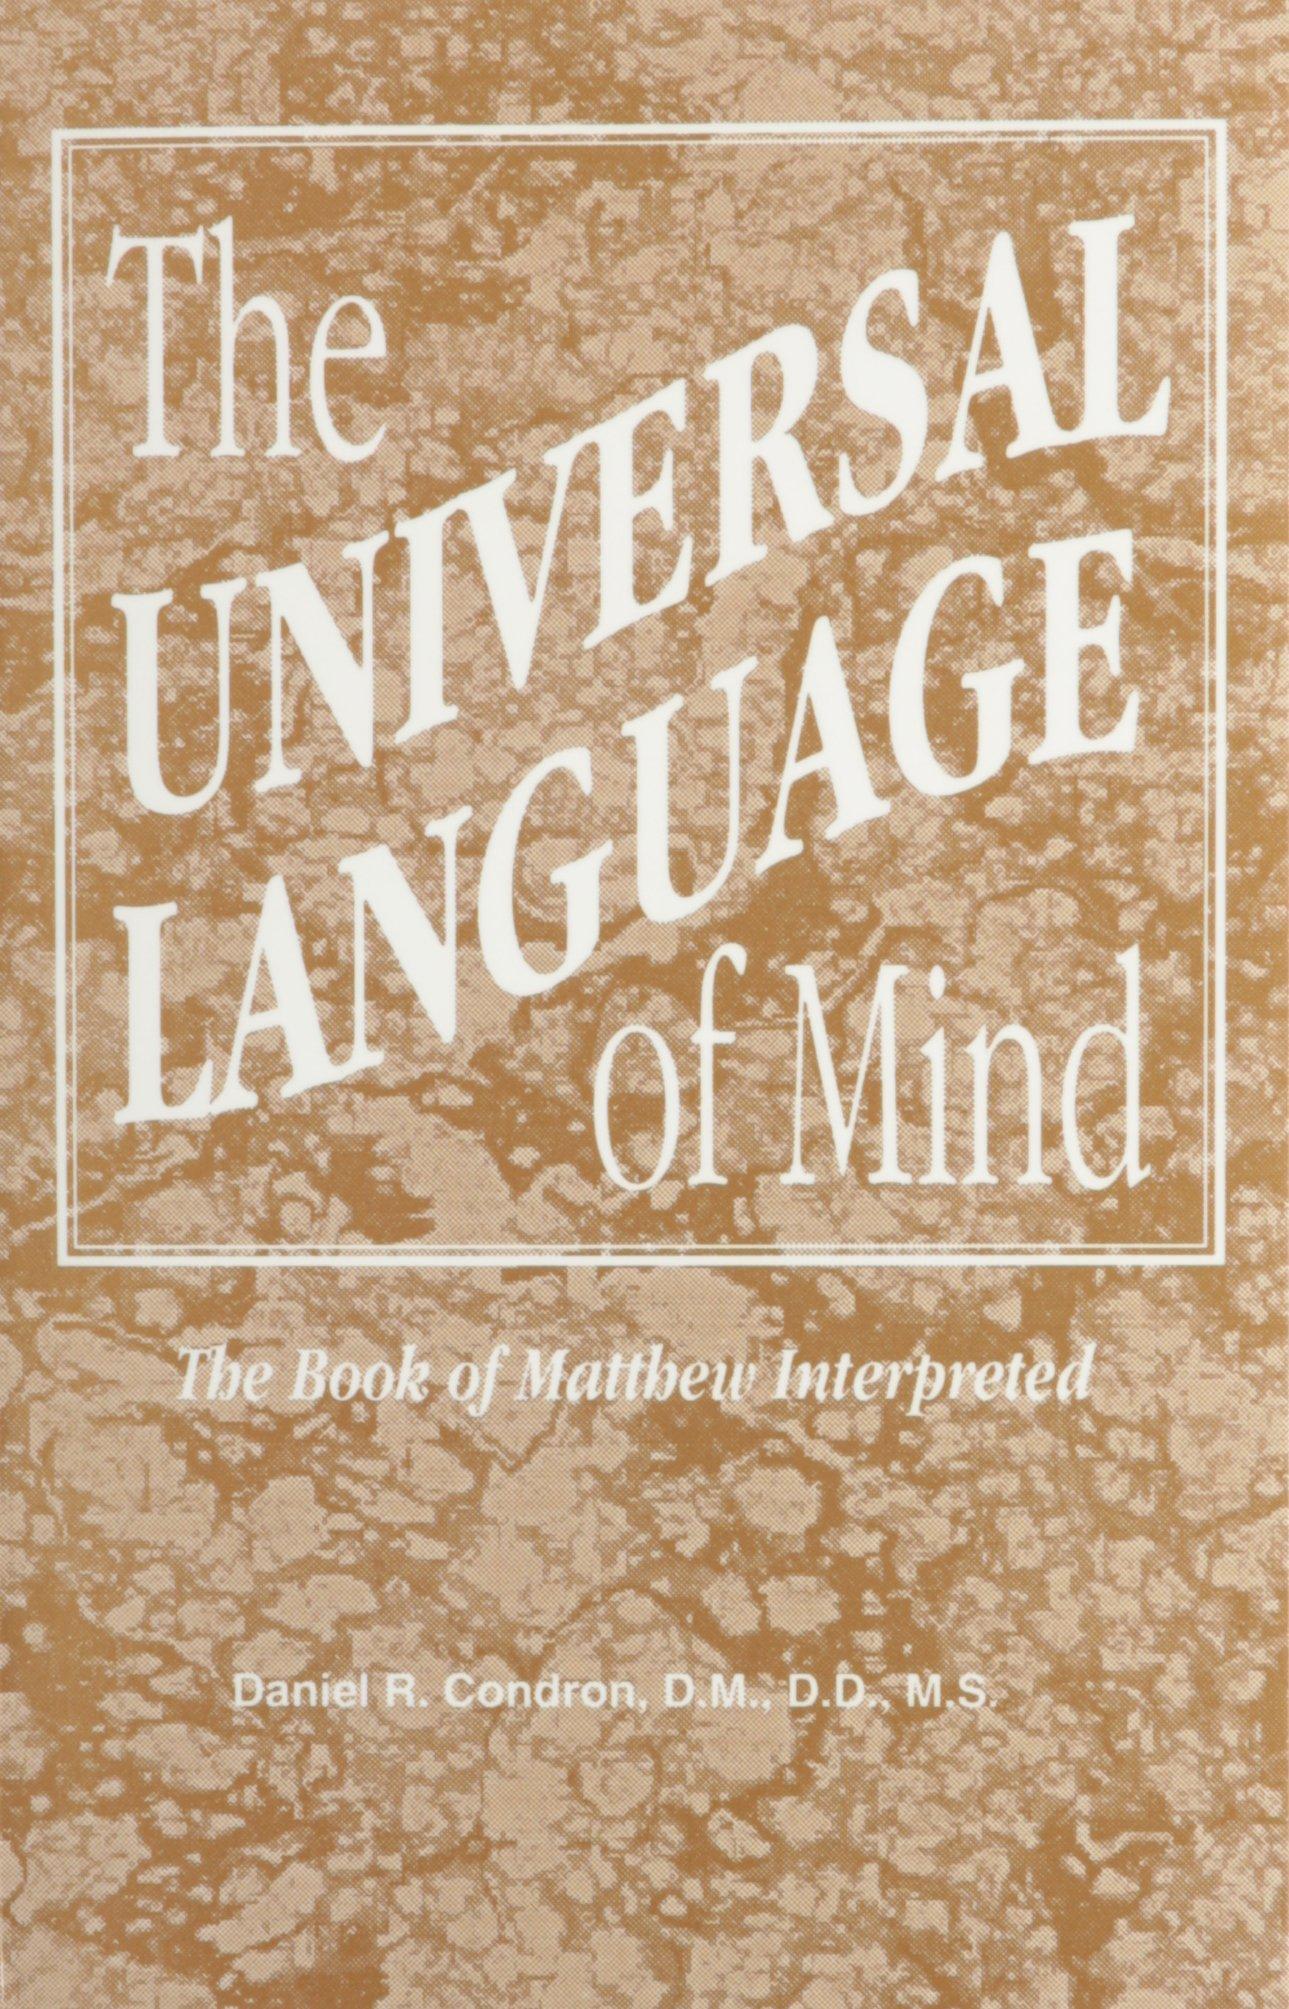 Universal Language of Mind: The Book of Matthew Interpreted